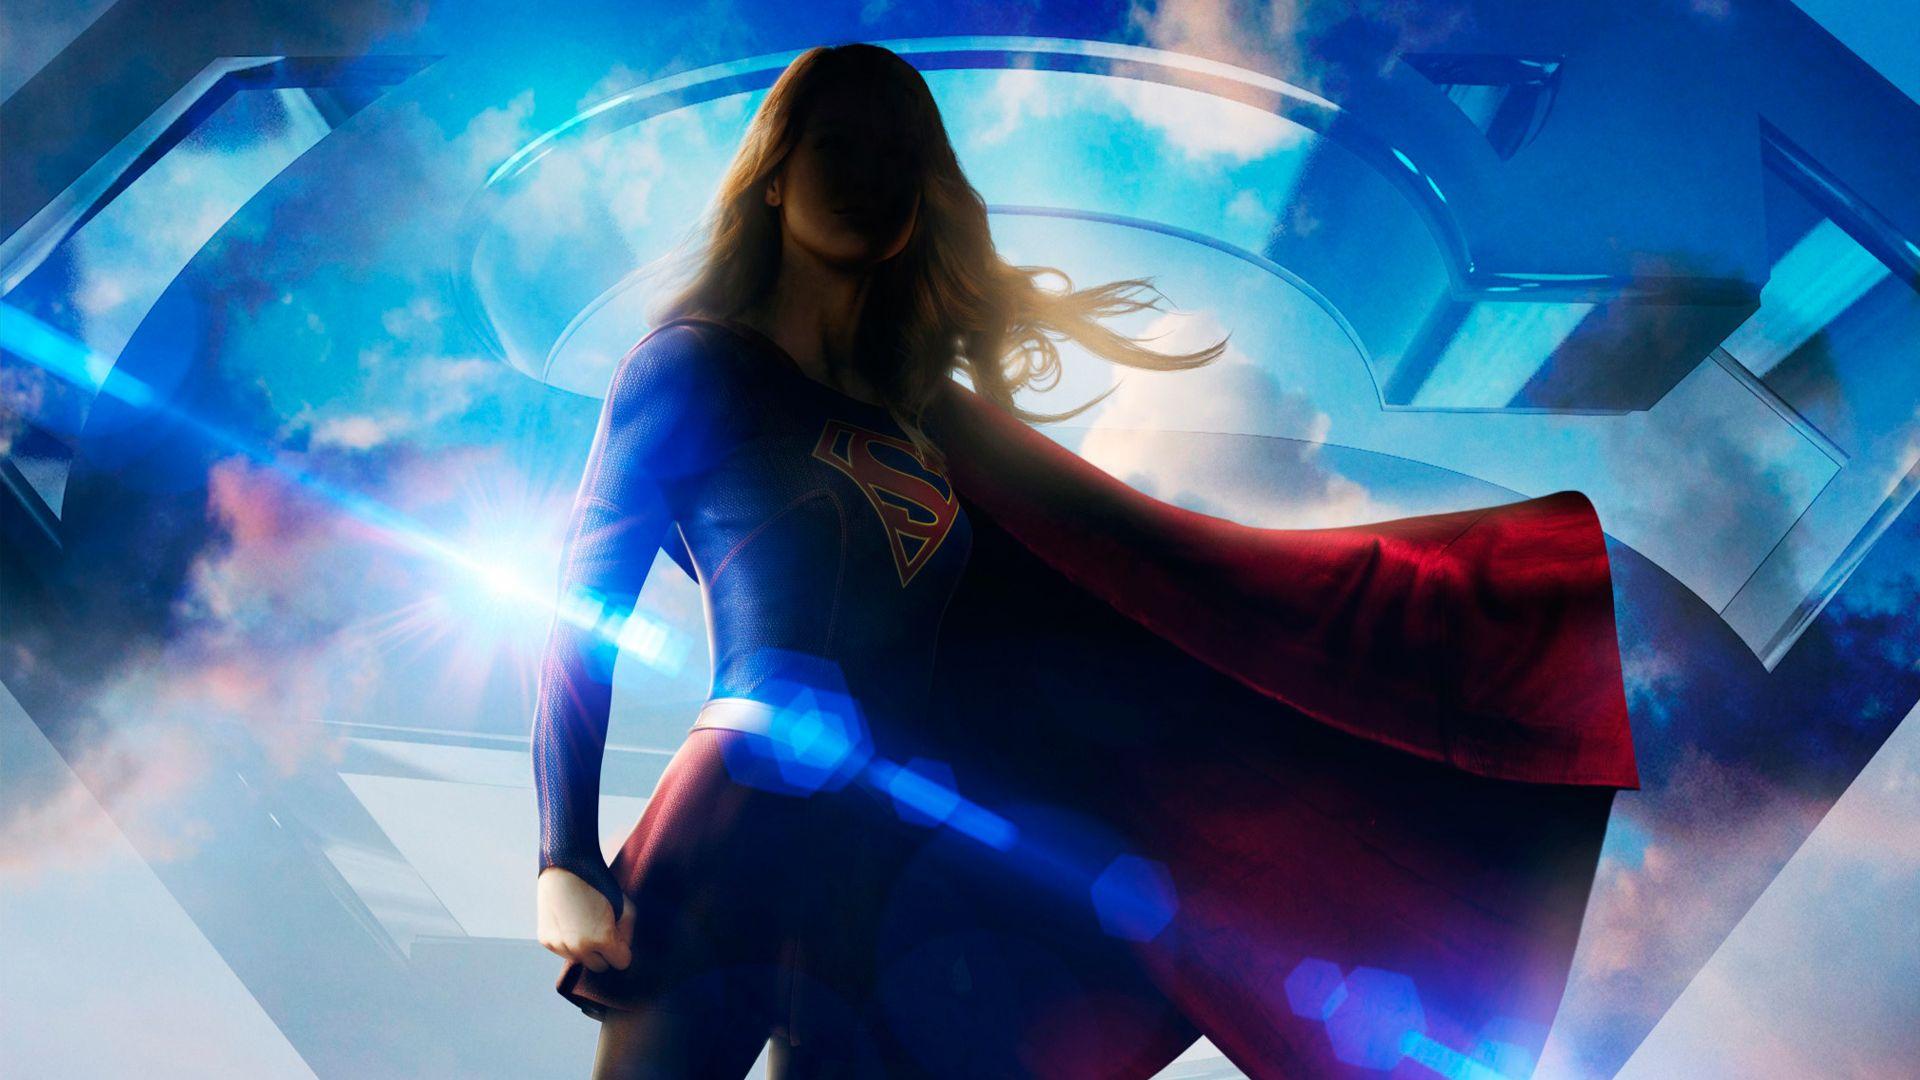 Thomas Lennon speelt Mxyzptlk in Supergirl